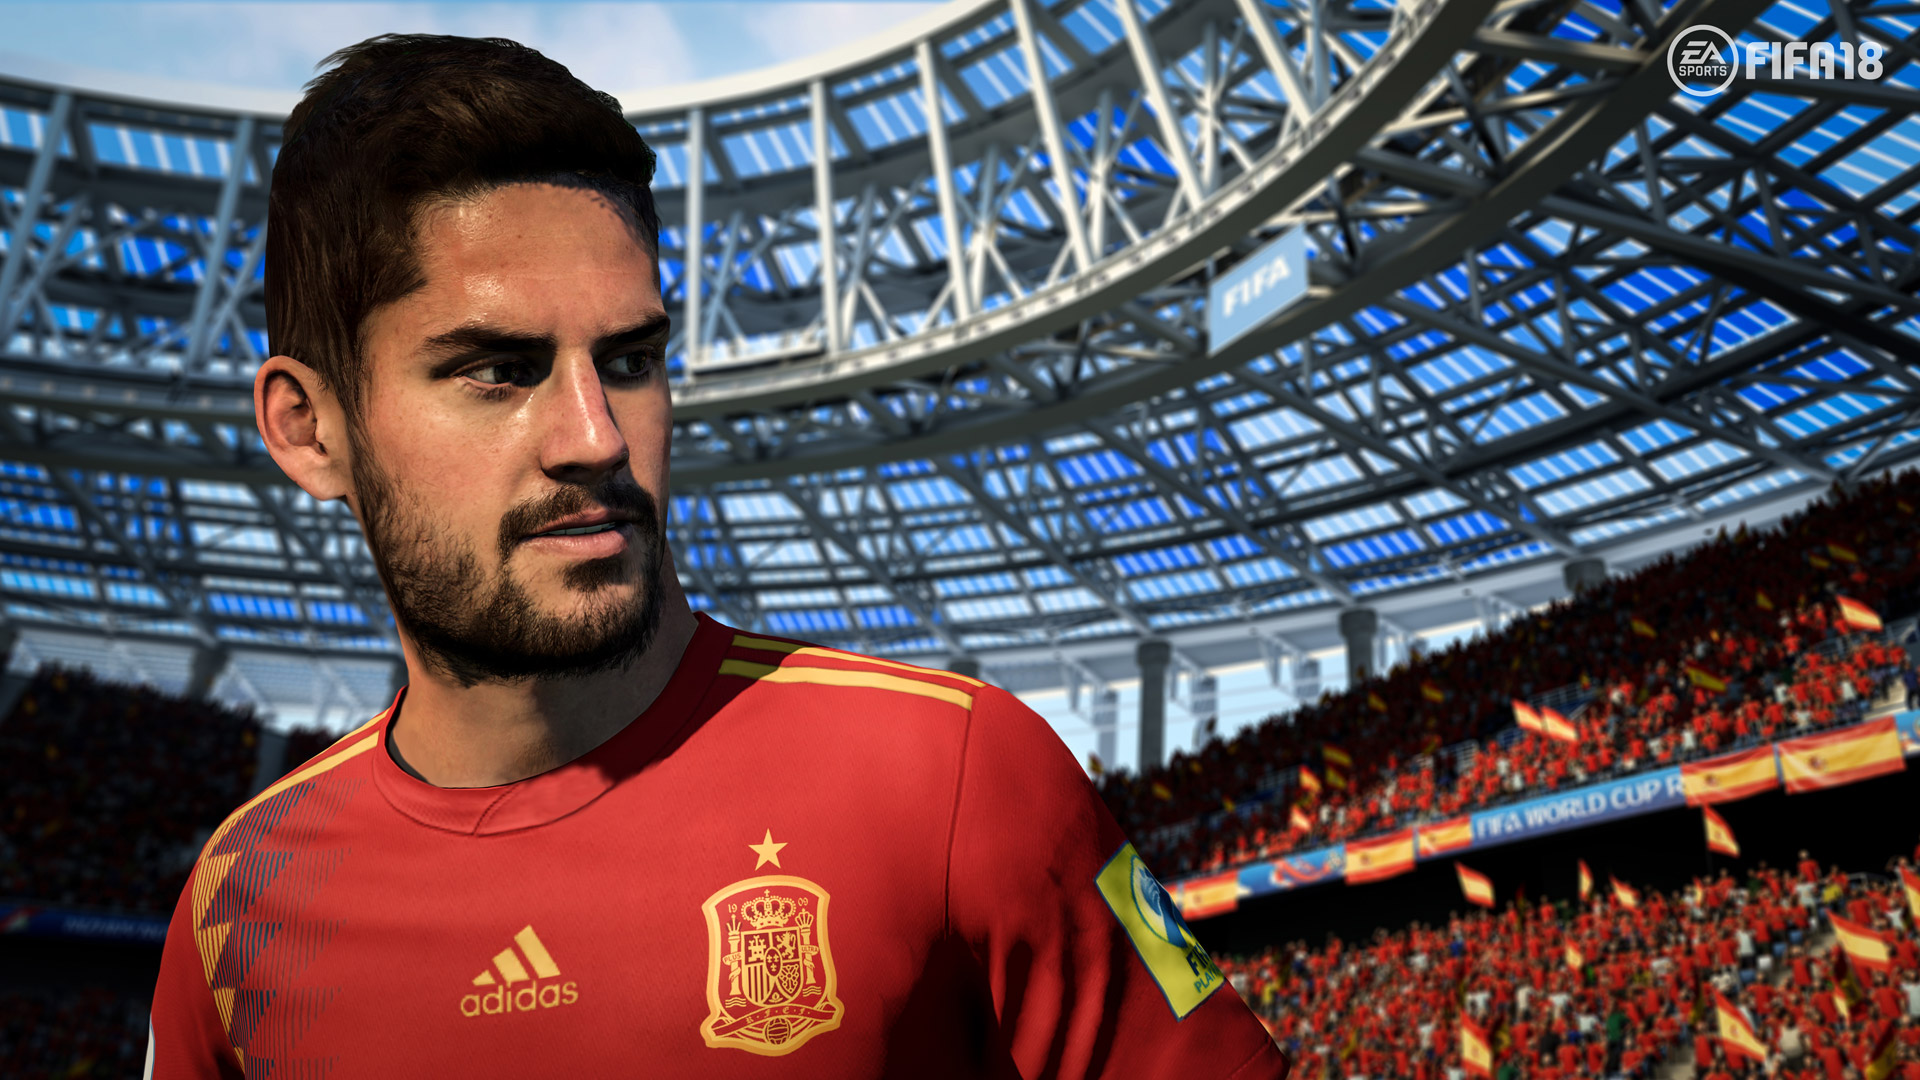 Free FIFA 18 Wallpaper in 1920x1080